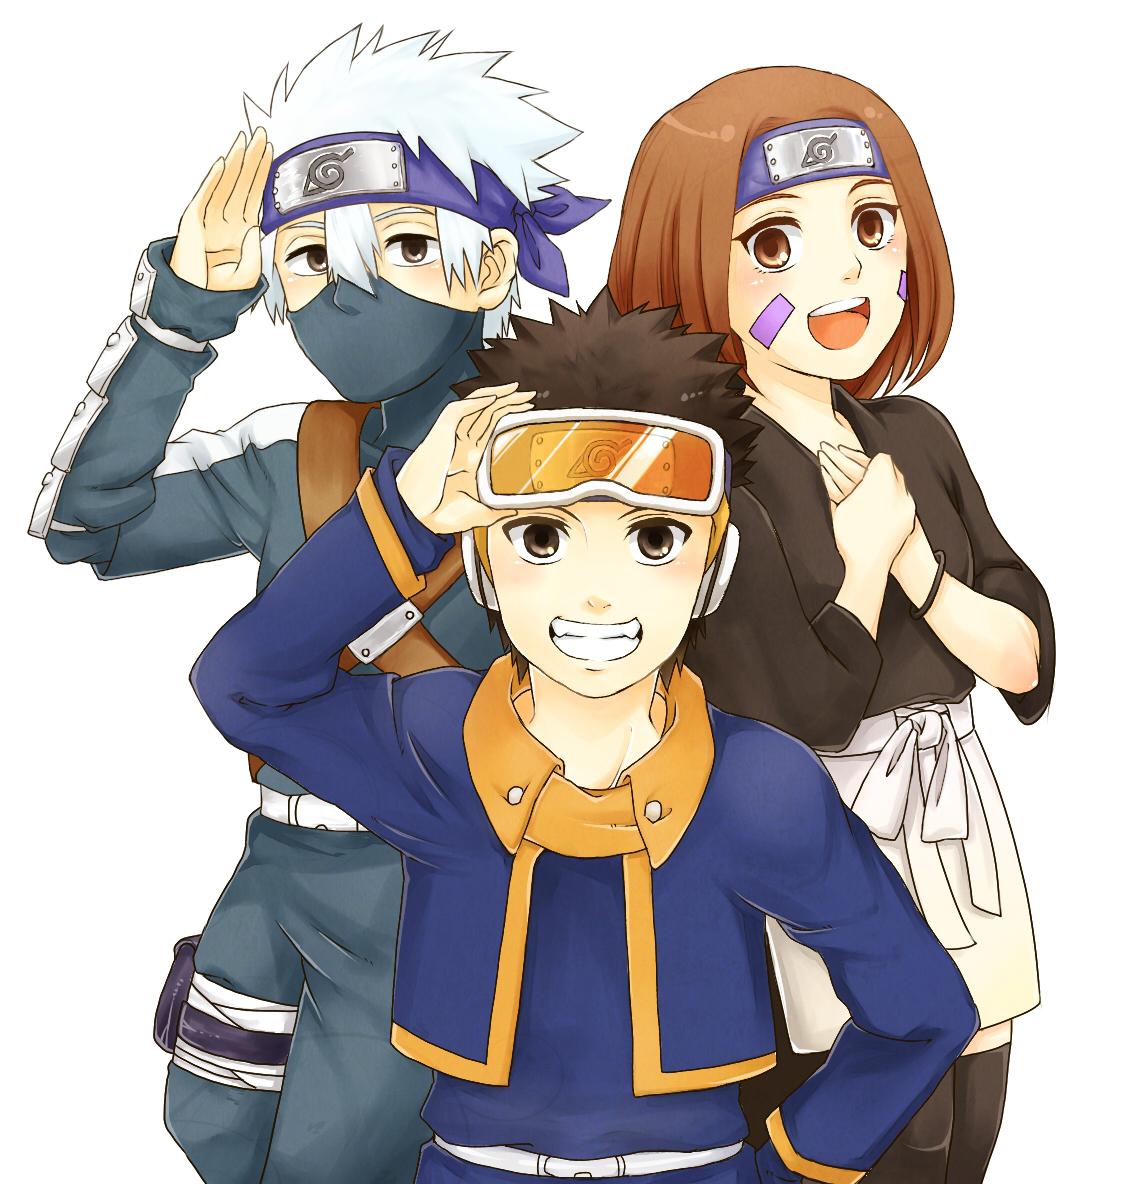 obito uchiha hình nền called Obito Uchiha, Kakashi and Rin